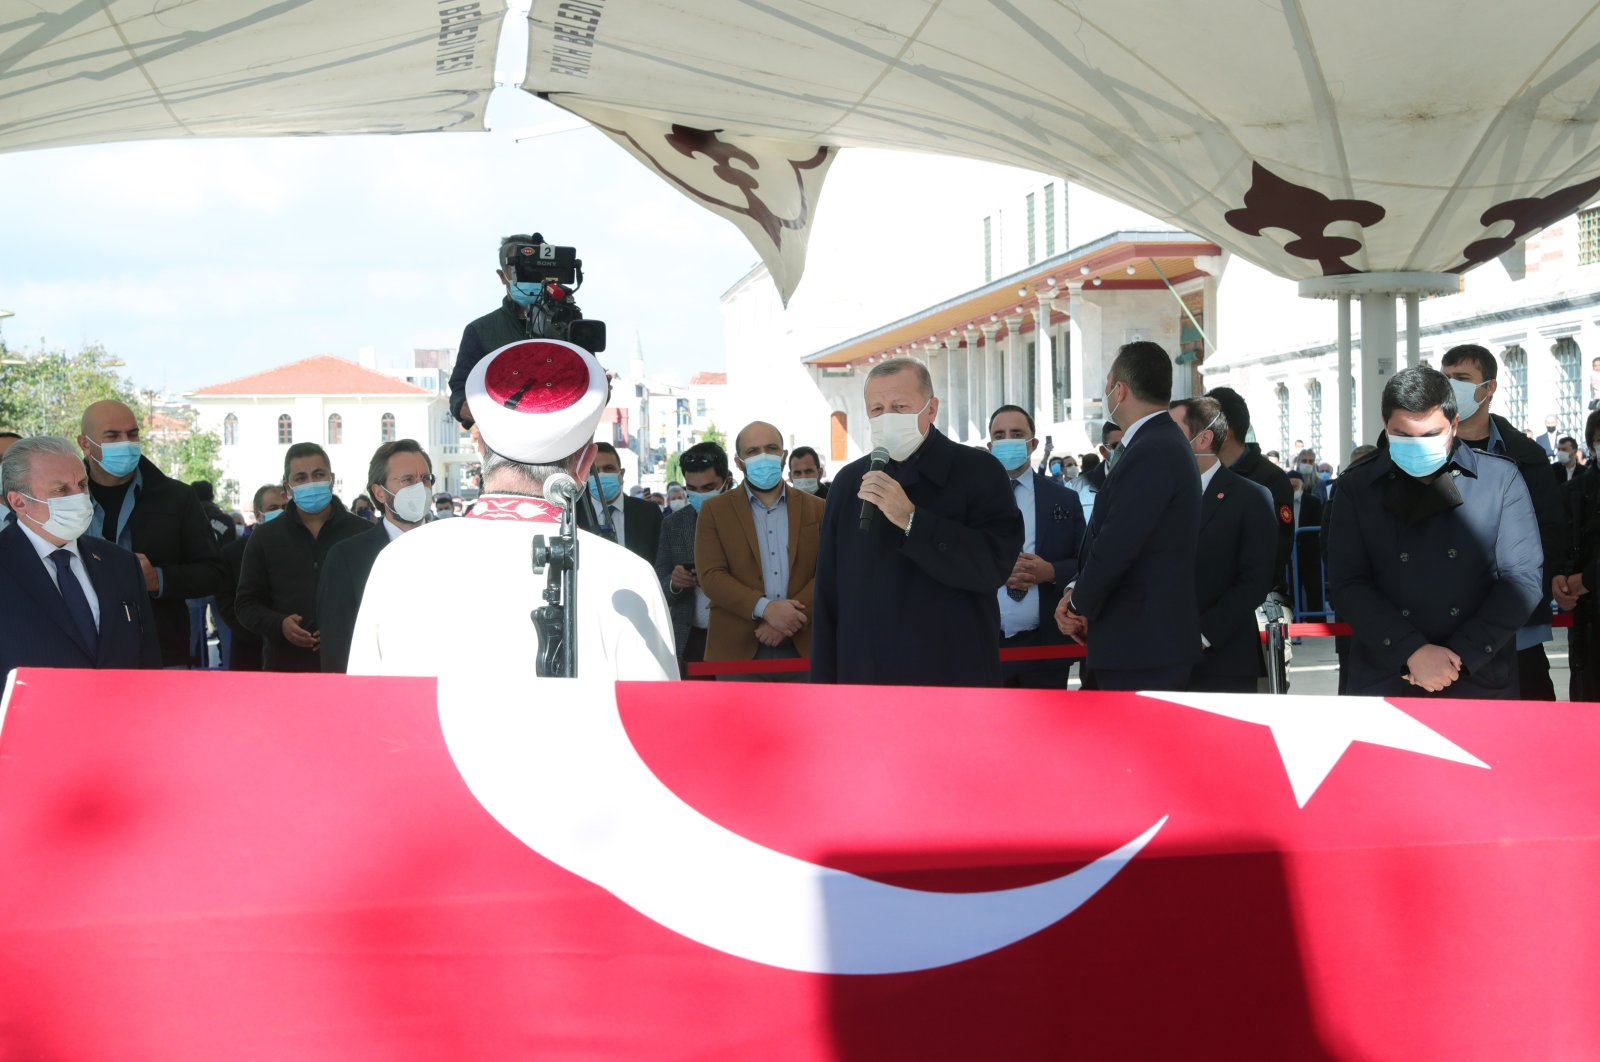 President Recep Tayyip Erdoğan delivers a speech during Burhan Kuzu's funeral ceremony in Istanbul's Fatih Mosque, Turkey, Nov. 2, 2020. (AA Photo)